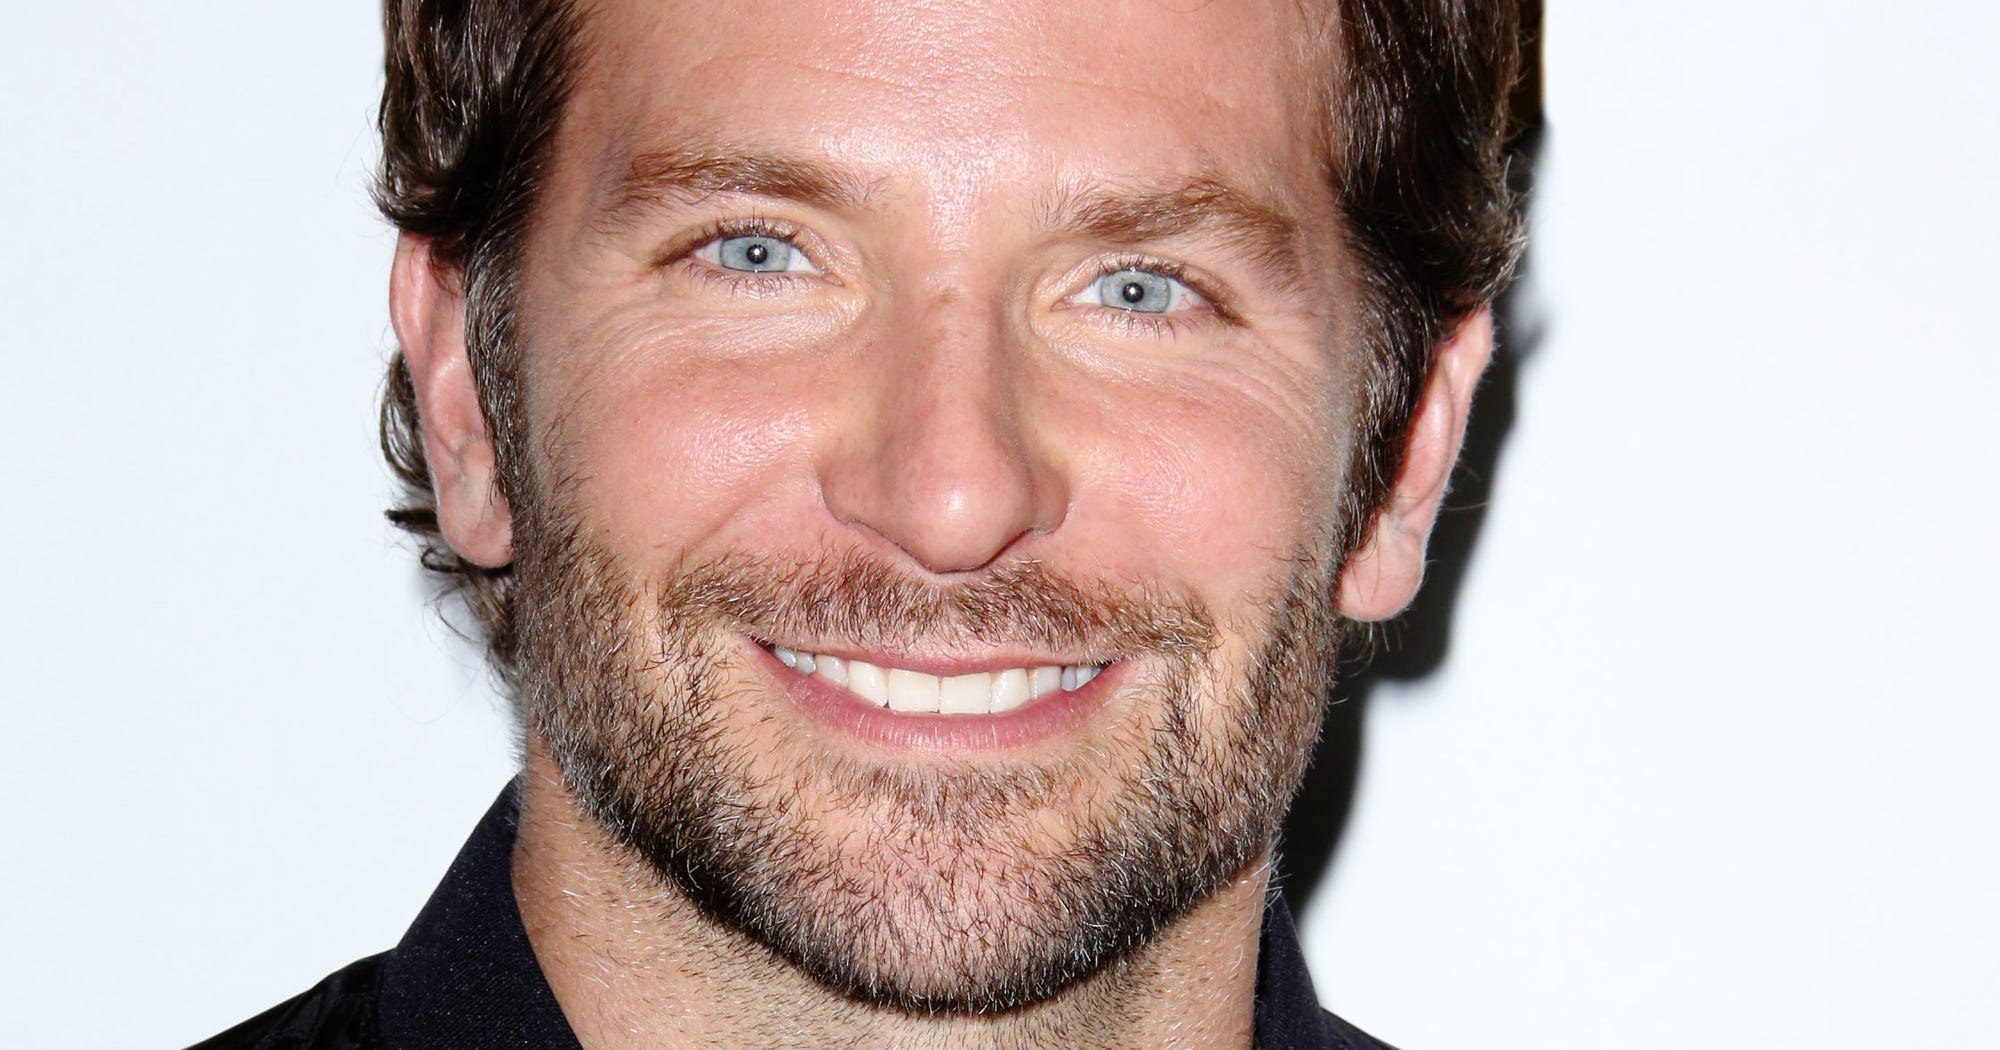 Bradley Cooper Stunt Double A Star Is Born Lookalike Bradley Cooper